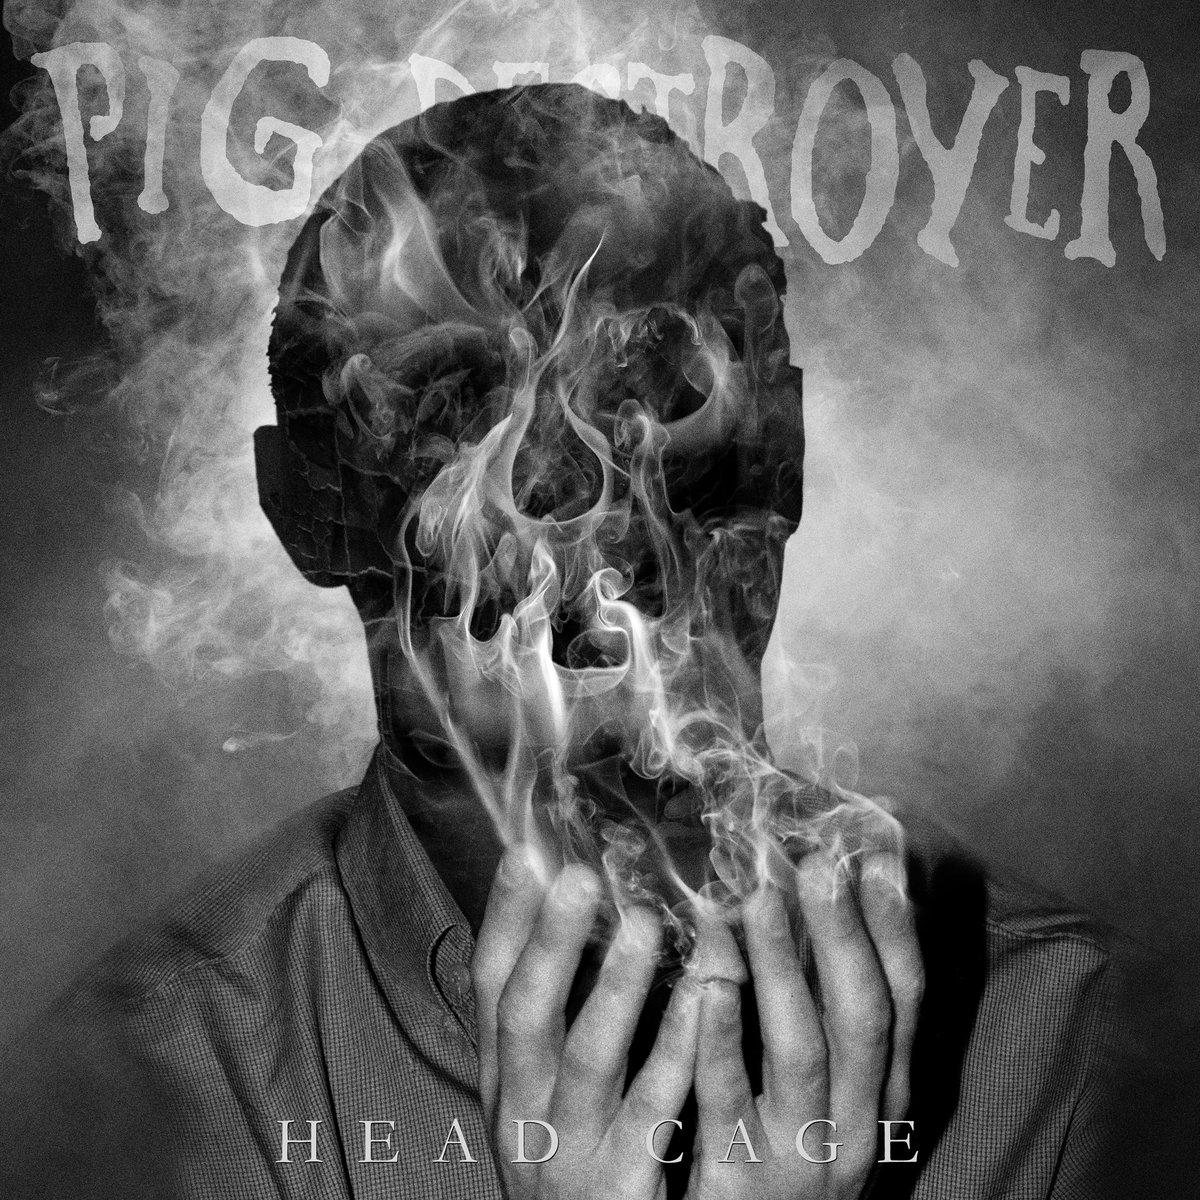 pig-destroyer-head-cage.jpg